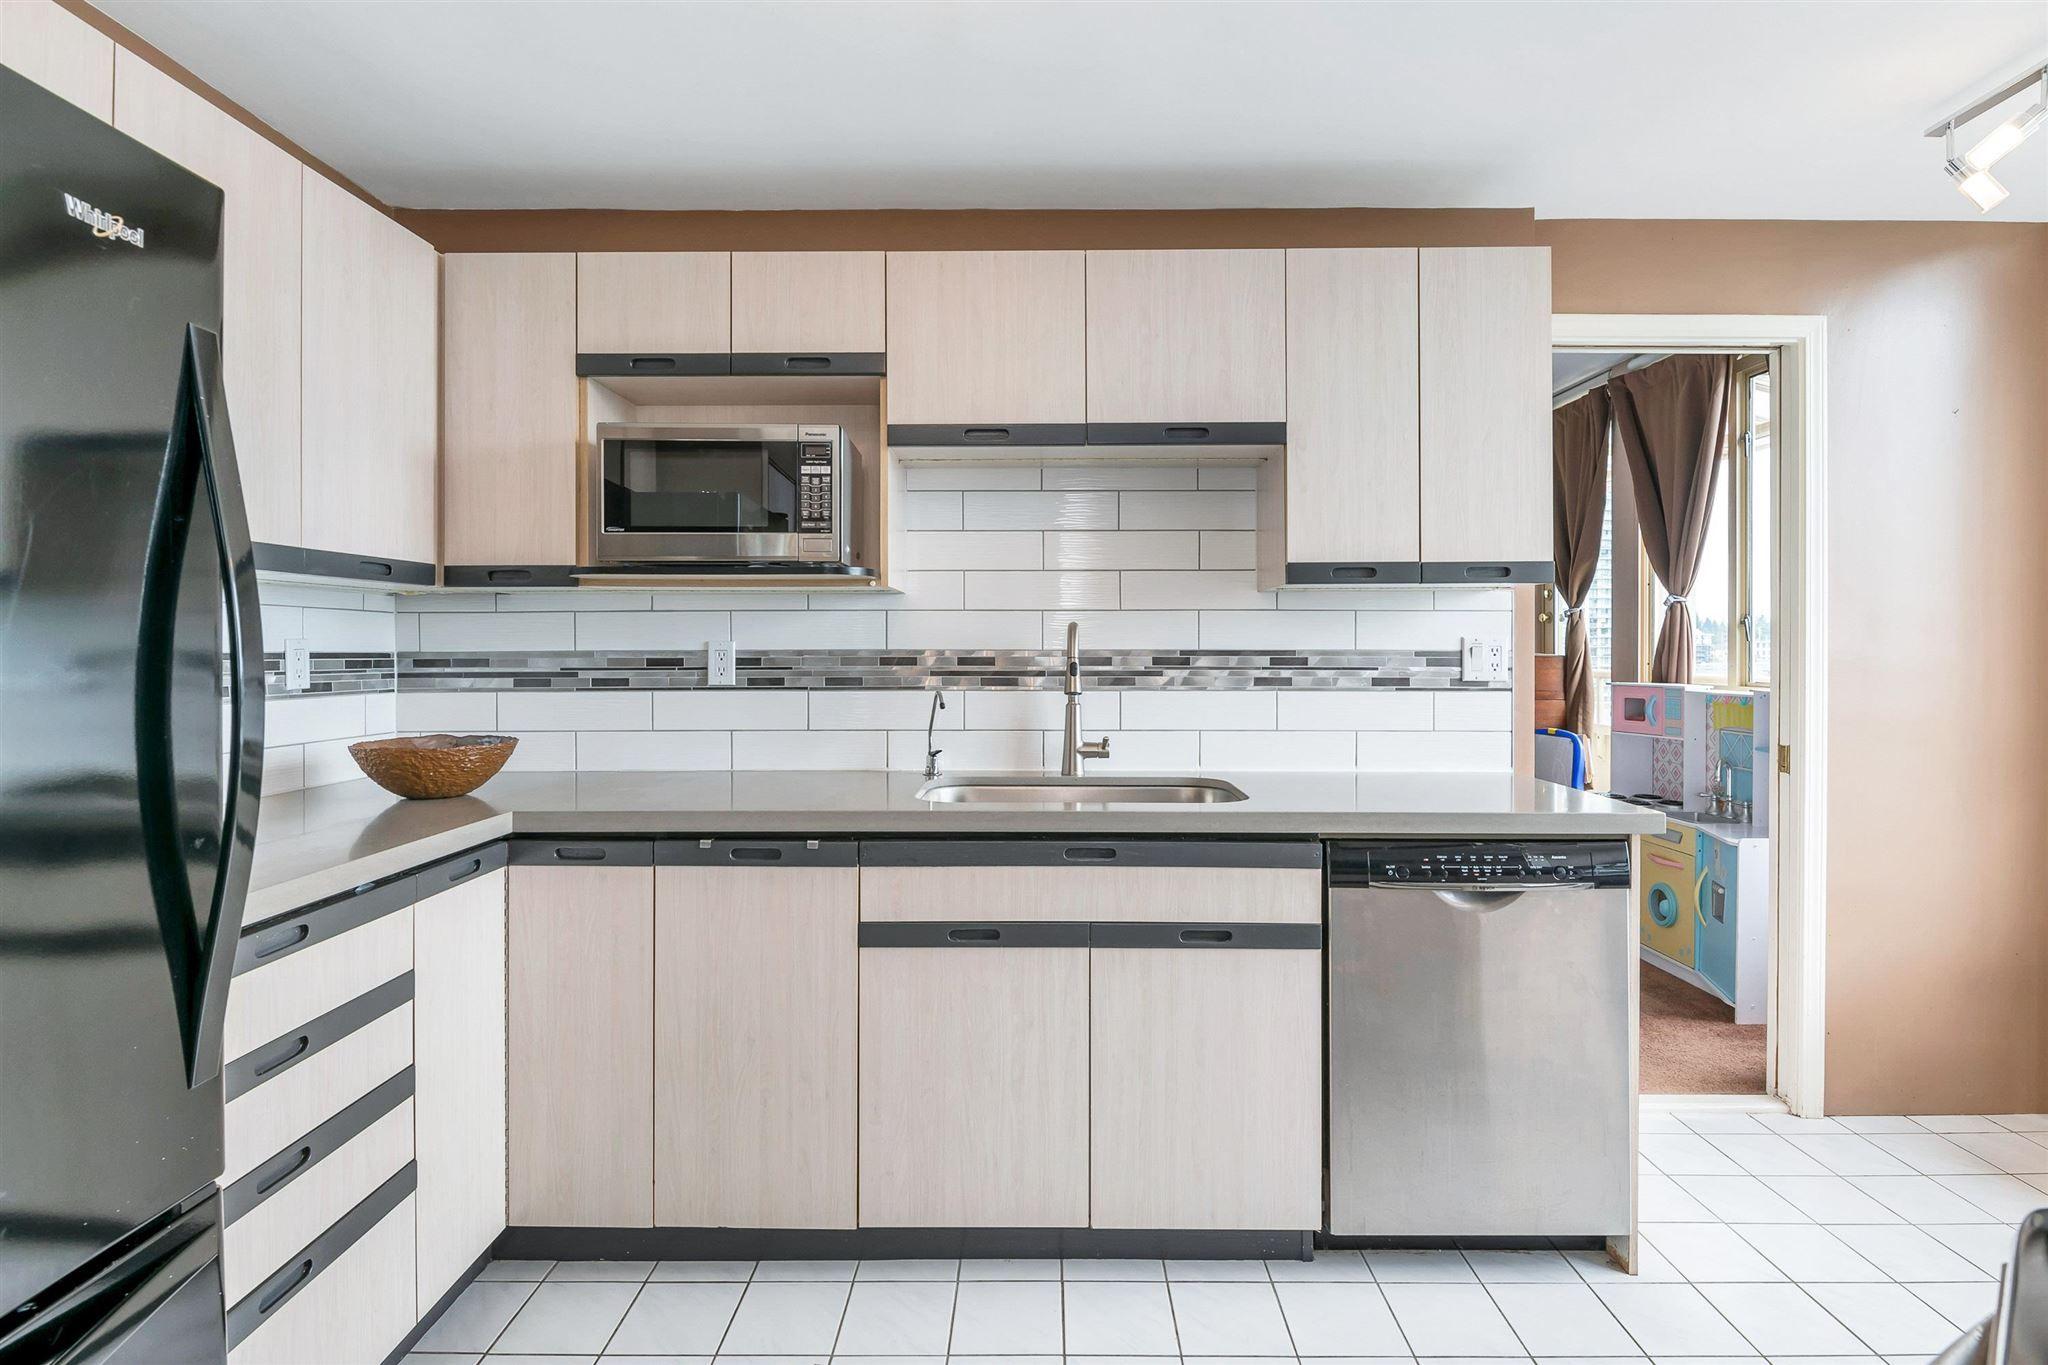 "Photo 12: Photos: 1401 728 FARROW Street in Coquitlam: Coquitlam West Condo for sale in ""THE VICTORIA"" : MLS®# R2615321"